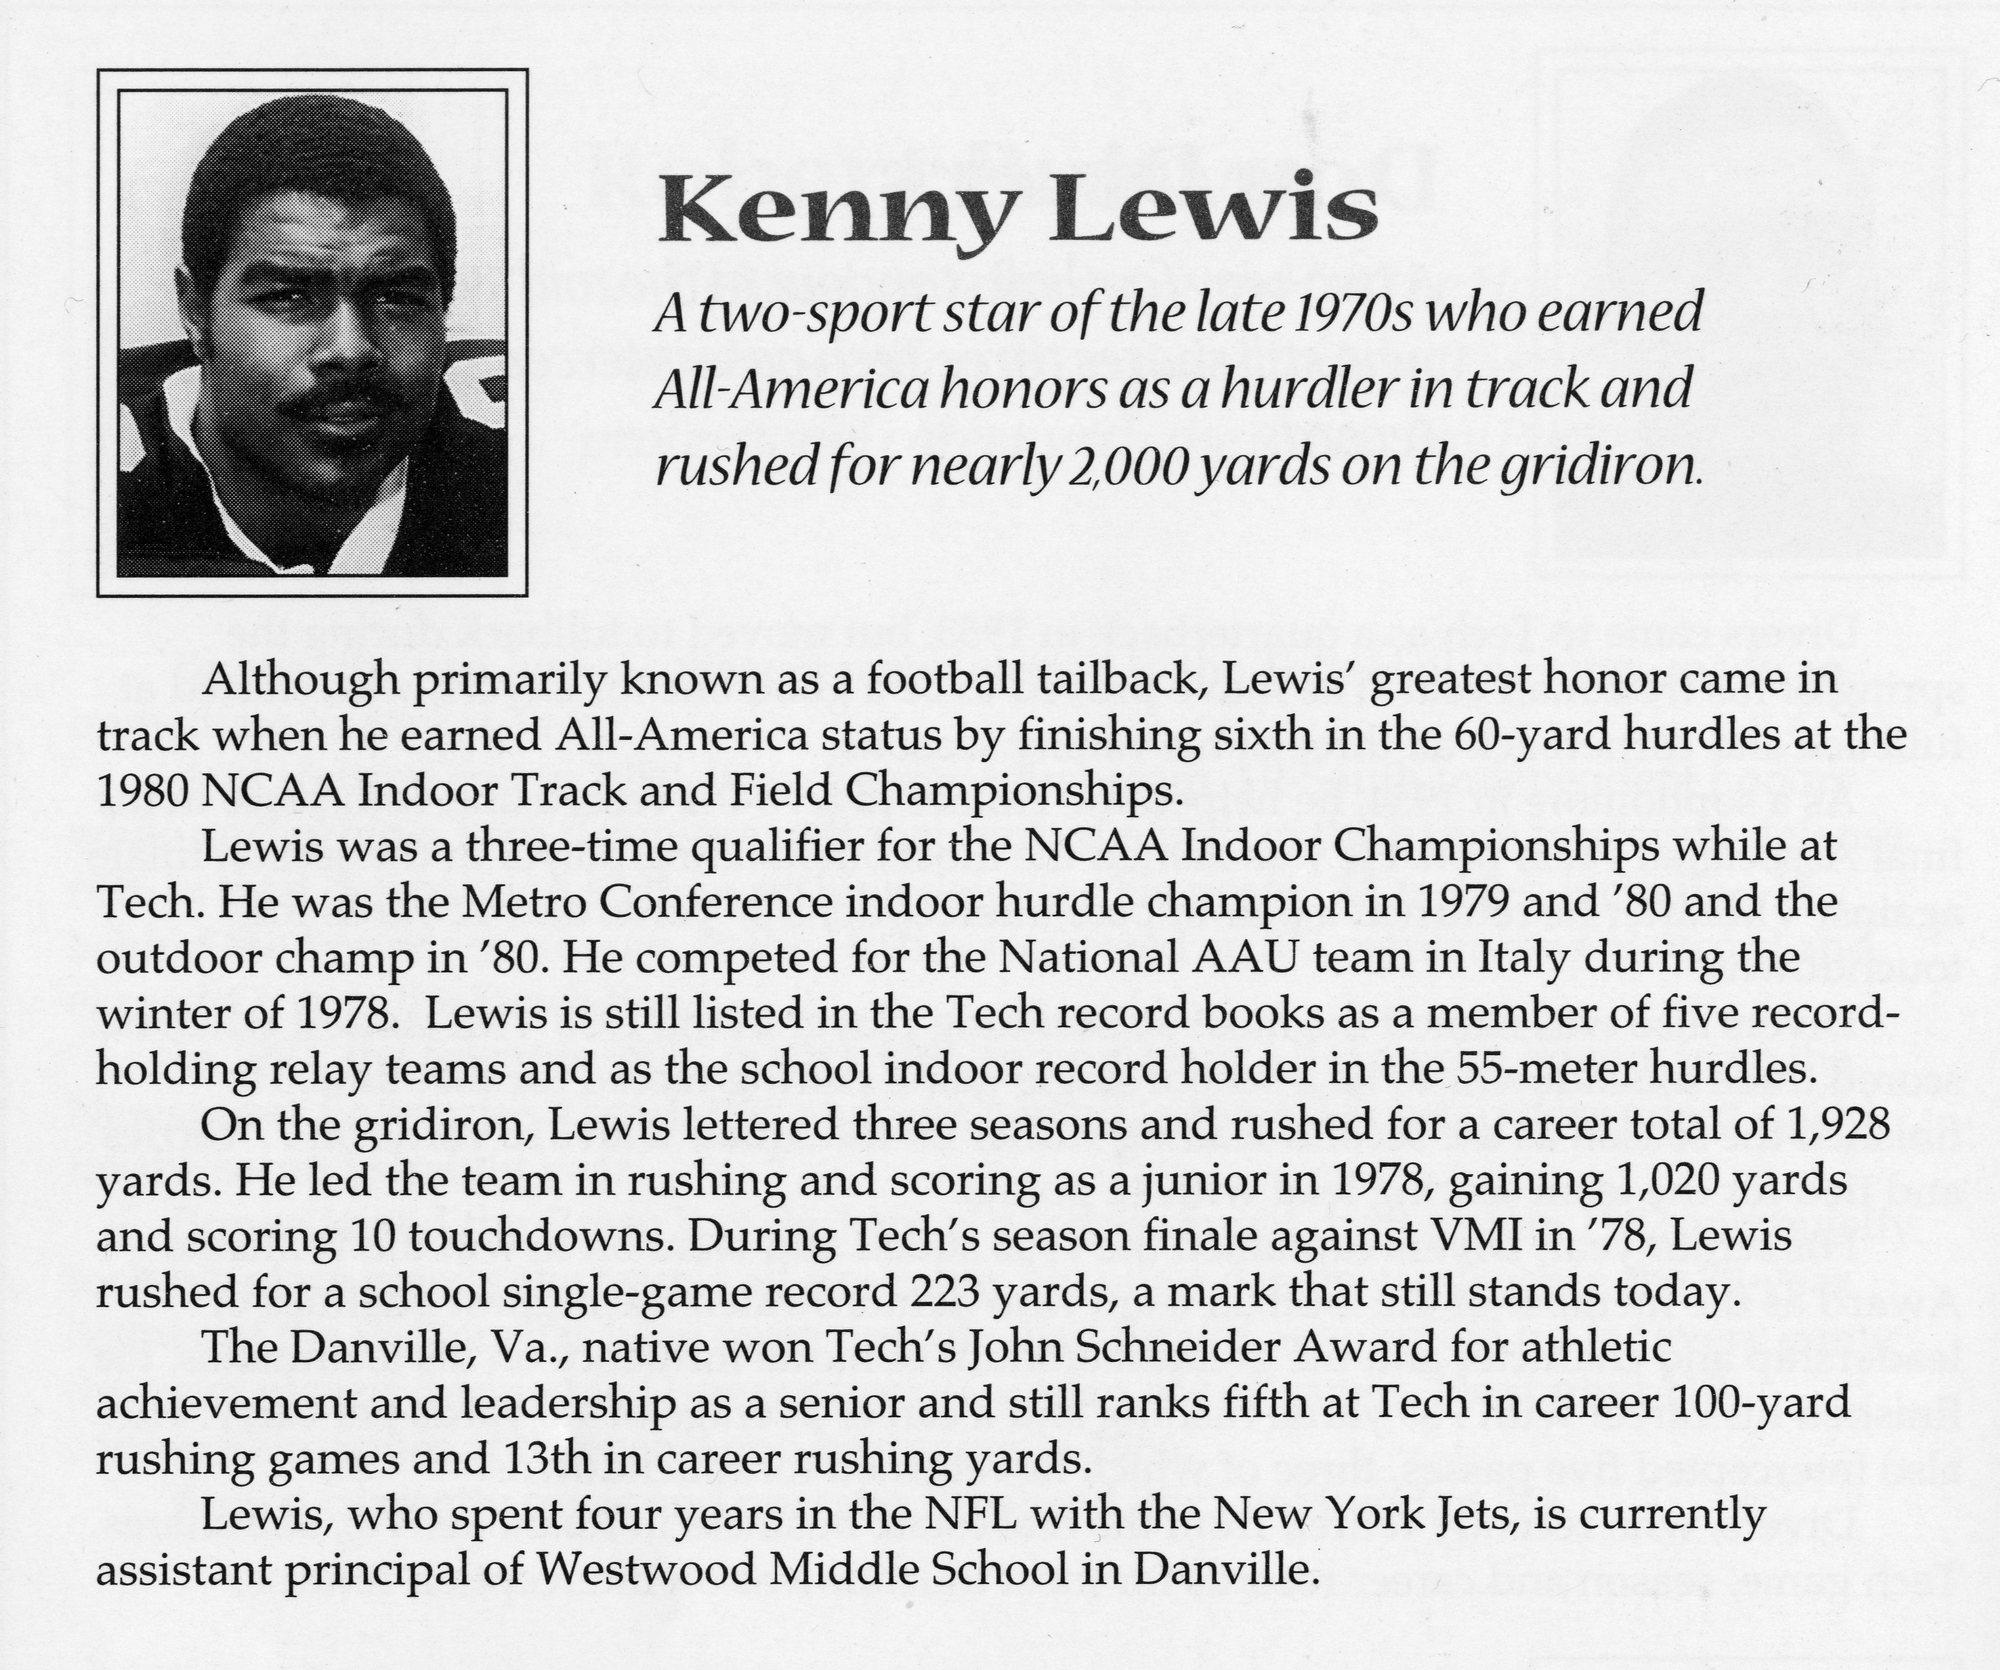 http://spec.lib.vt.edu/pickup/Omeka_upload/LewisKenny_1998.jpg